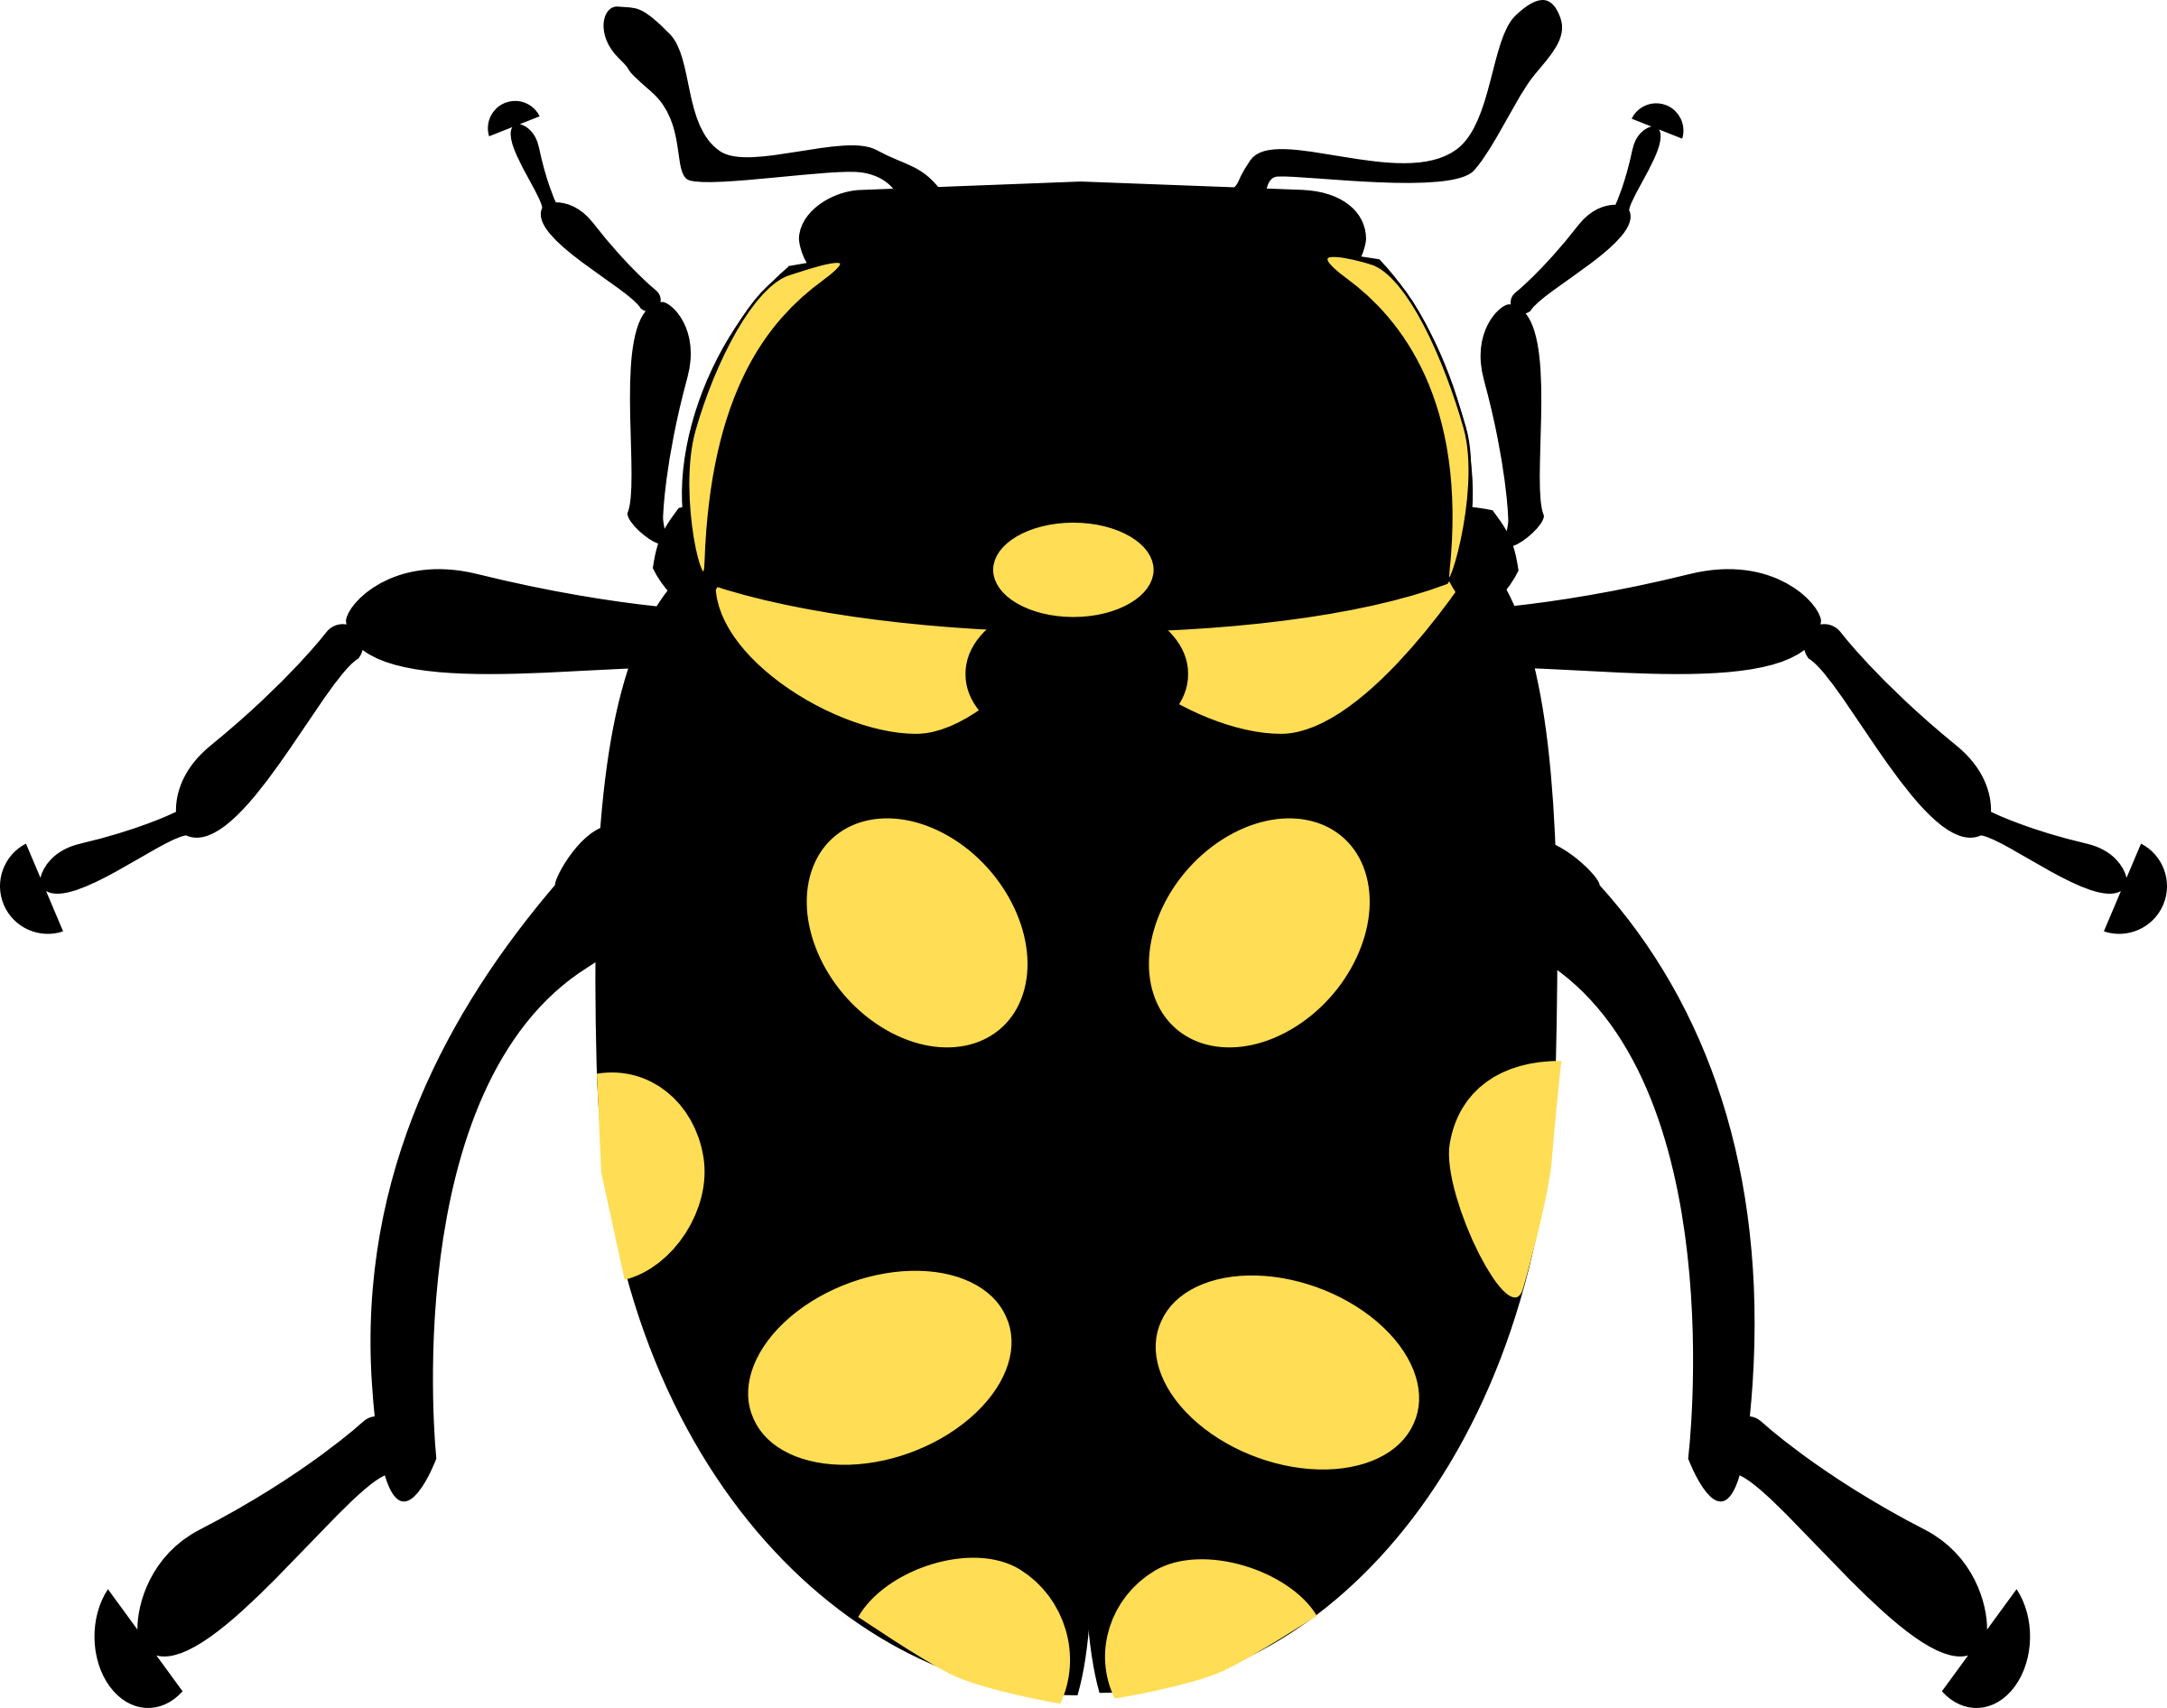 jpg freeuse library Eriopis canrash bug big. Beetle clipart arthropod.